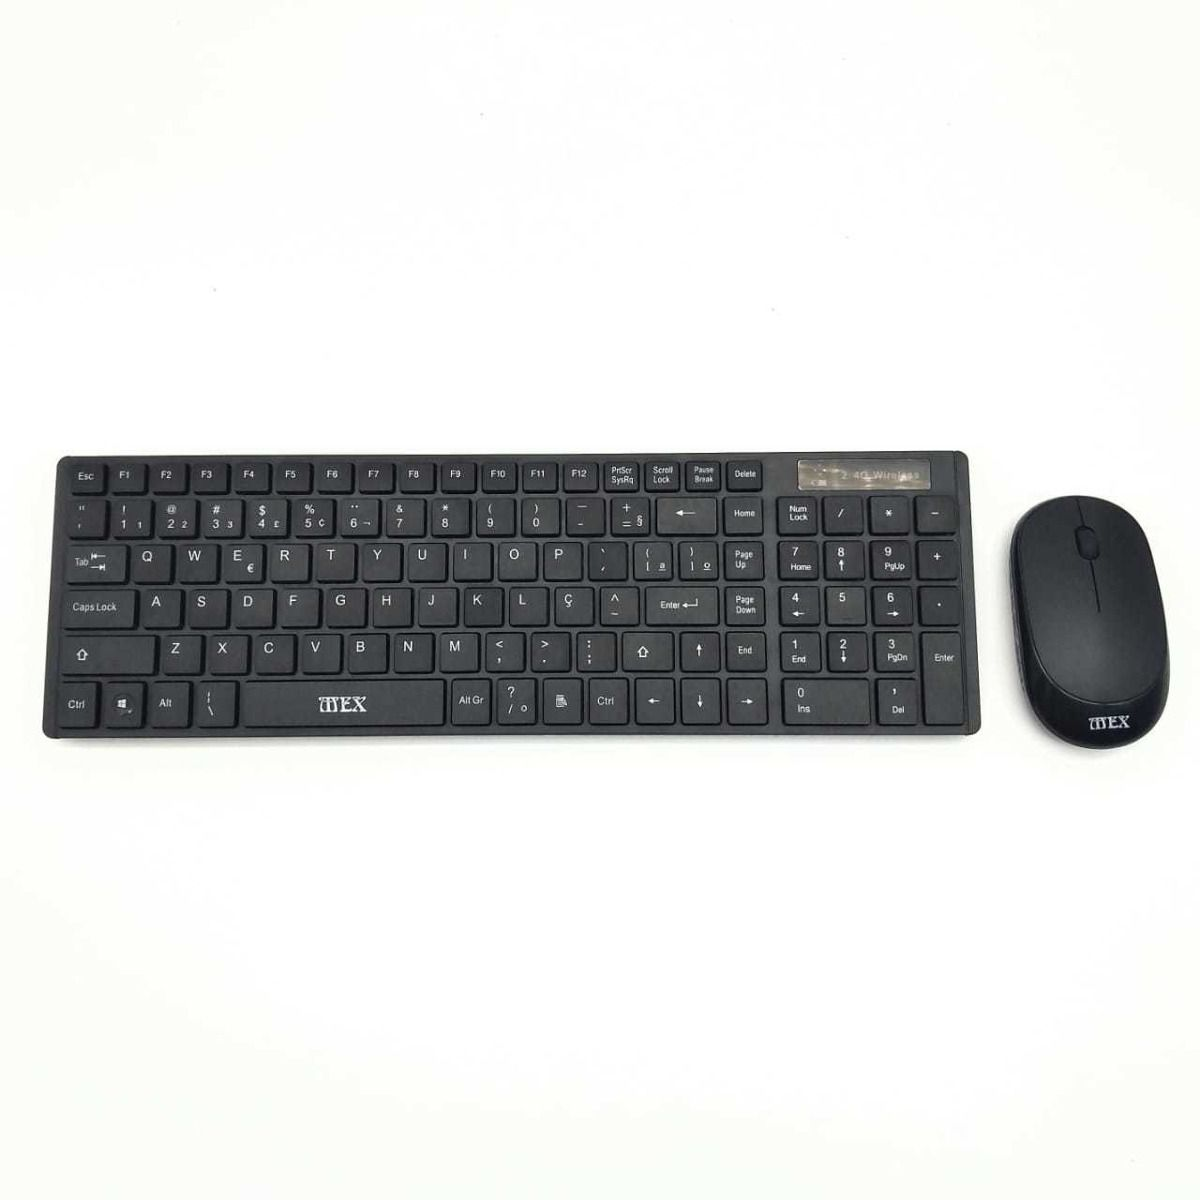 kit Teclado + Mouse wireless Mex-206